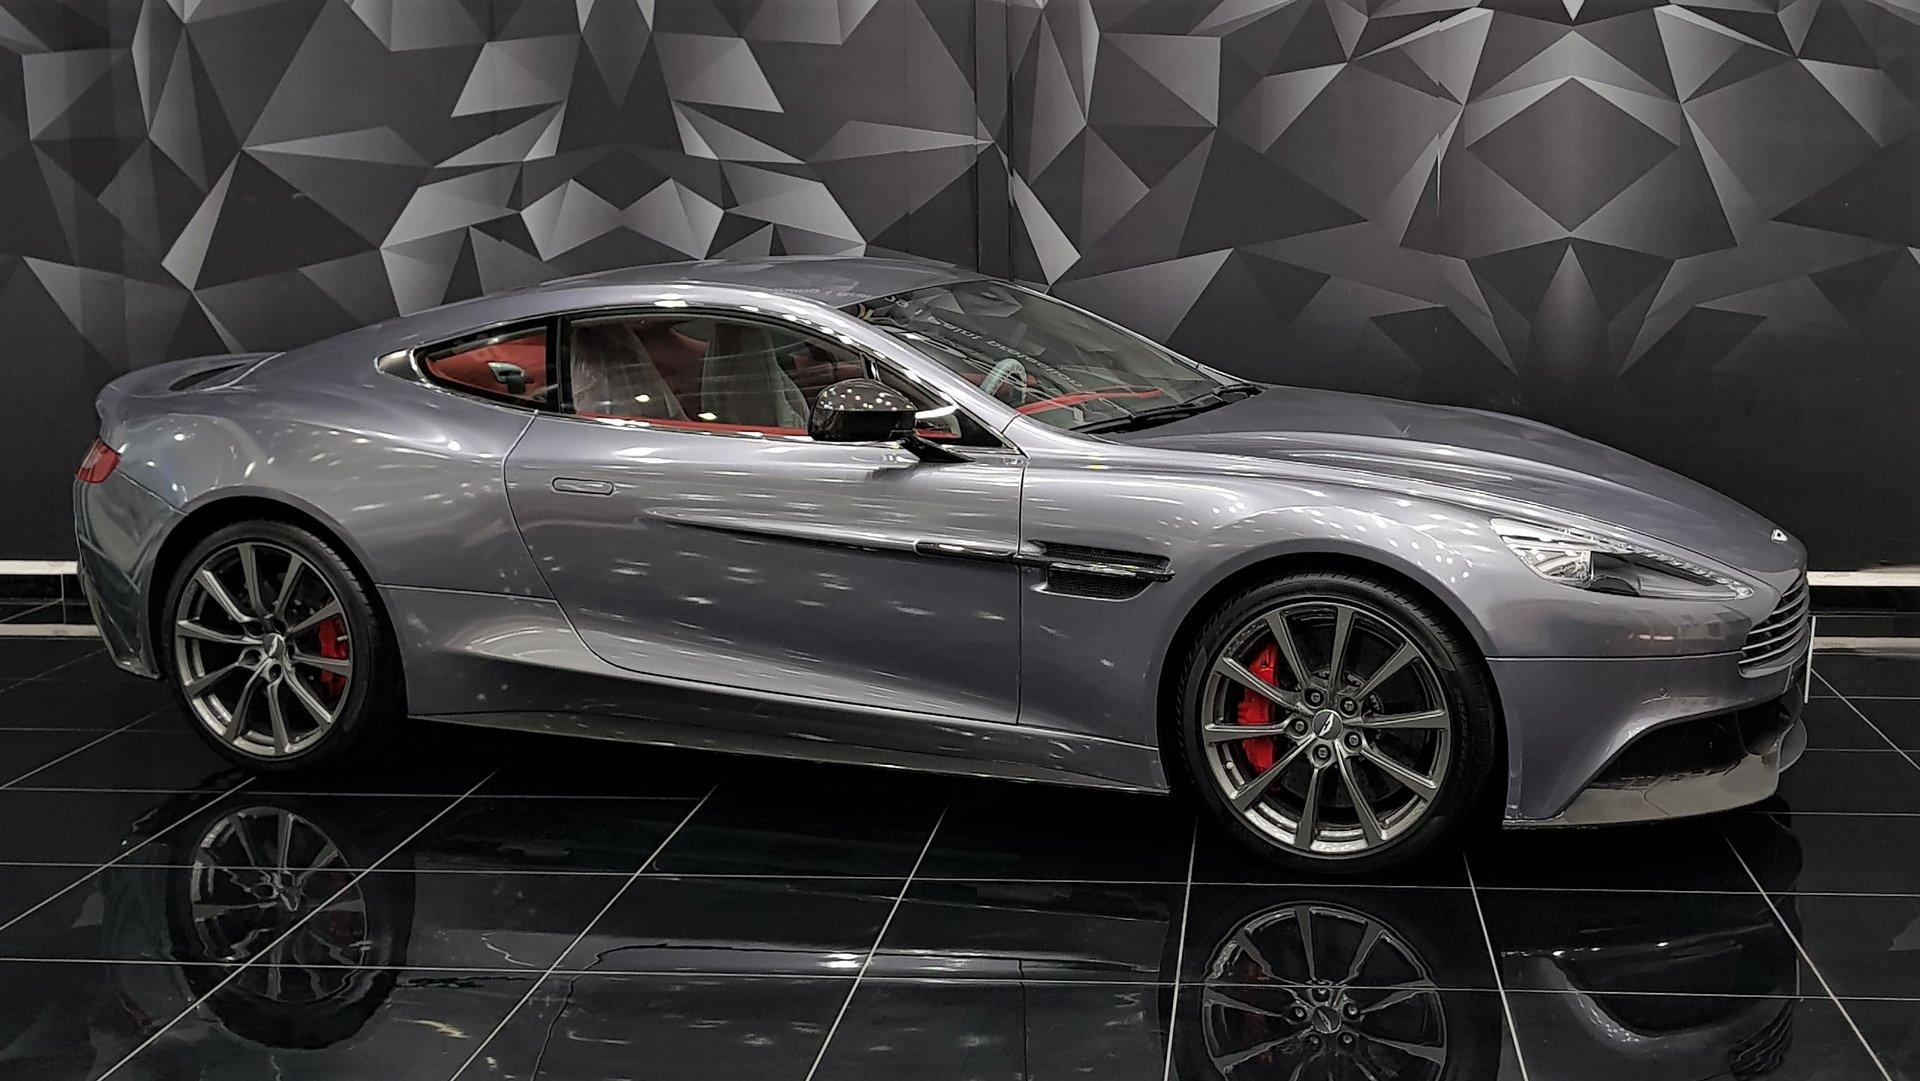 Aston Martin Vanquish Grey Gloss Wrap Wrapstyle